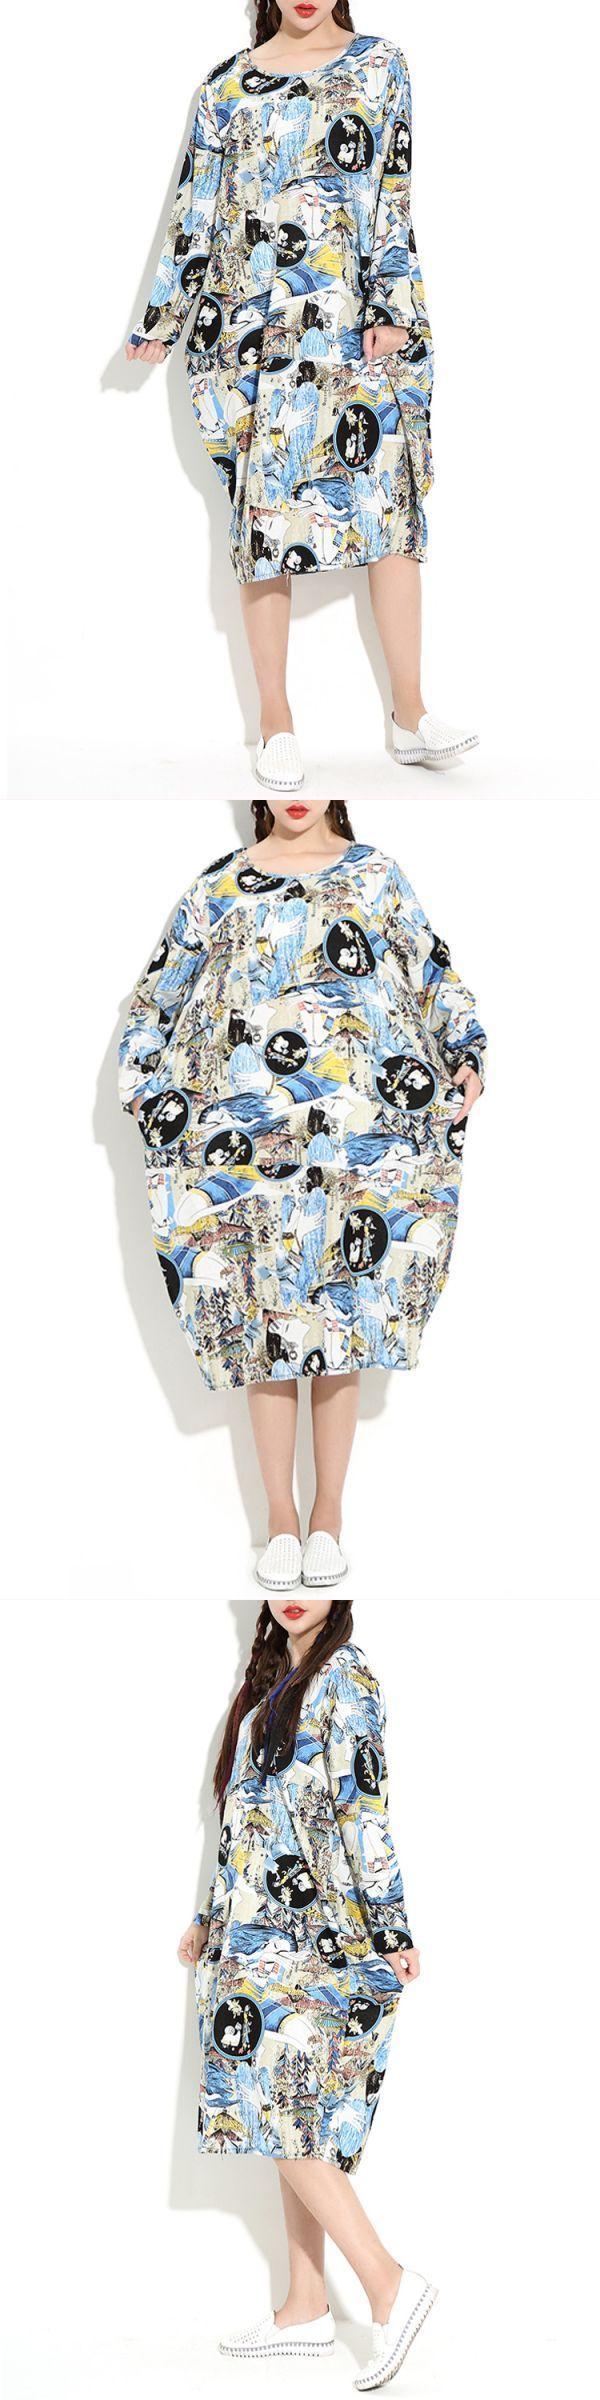 best casual dresses images on pinterest